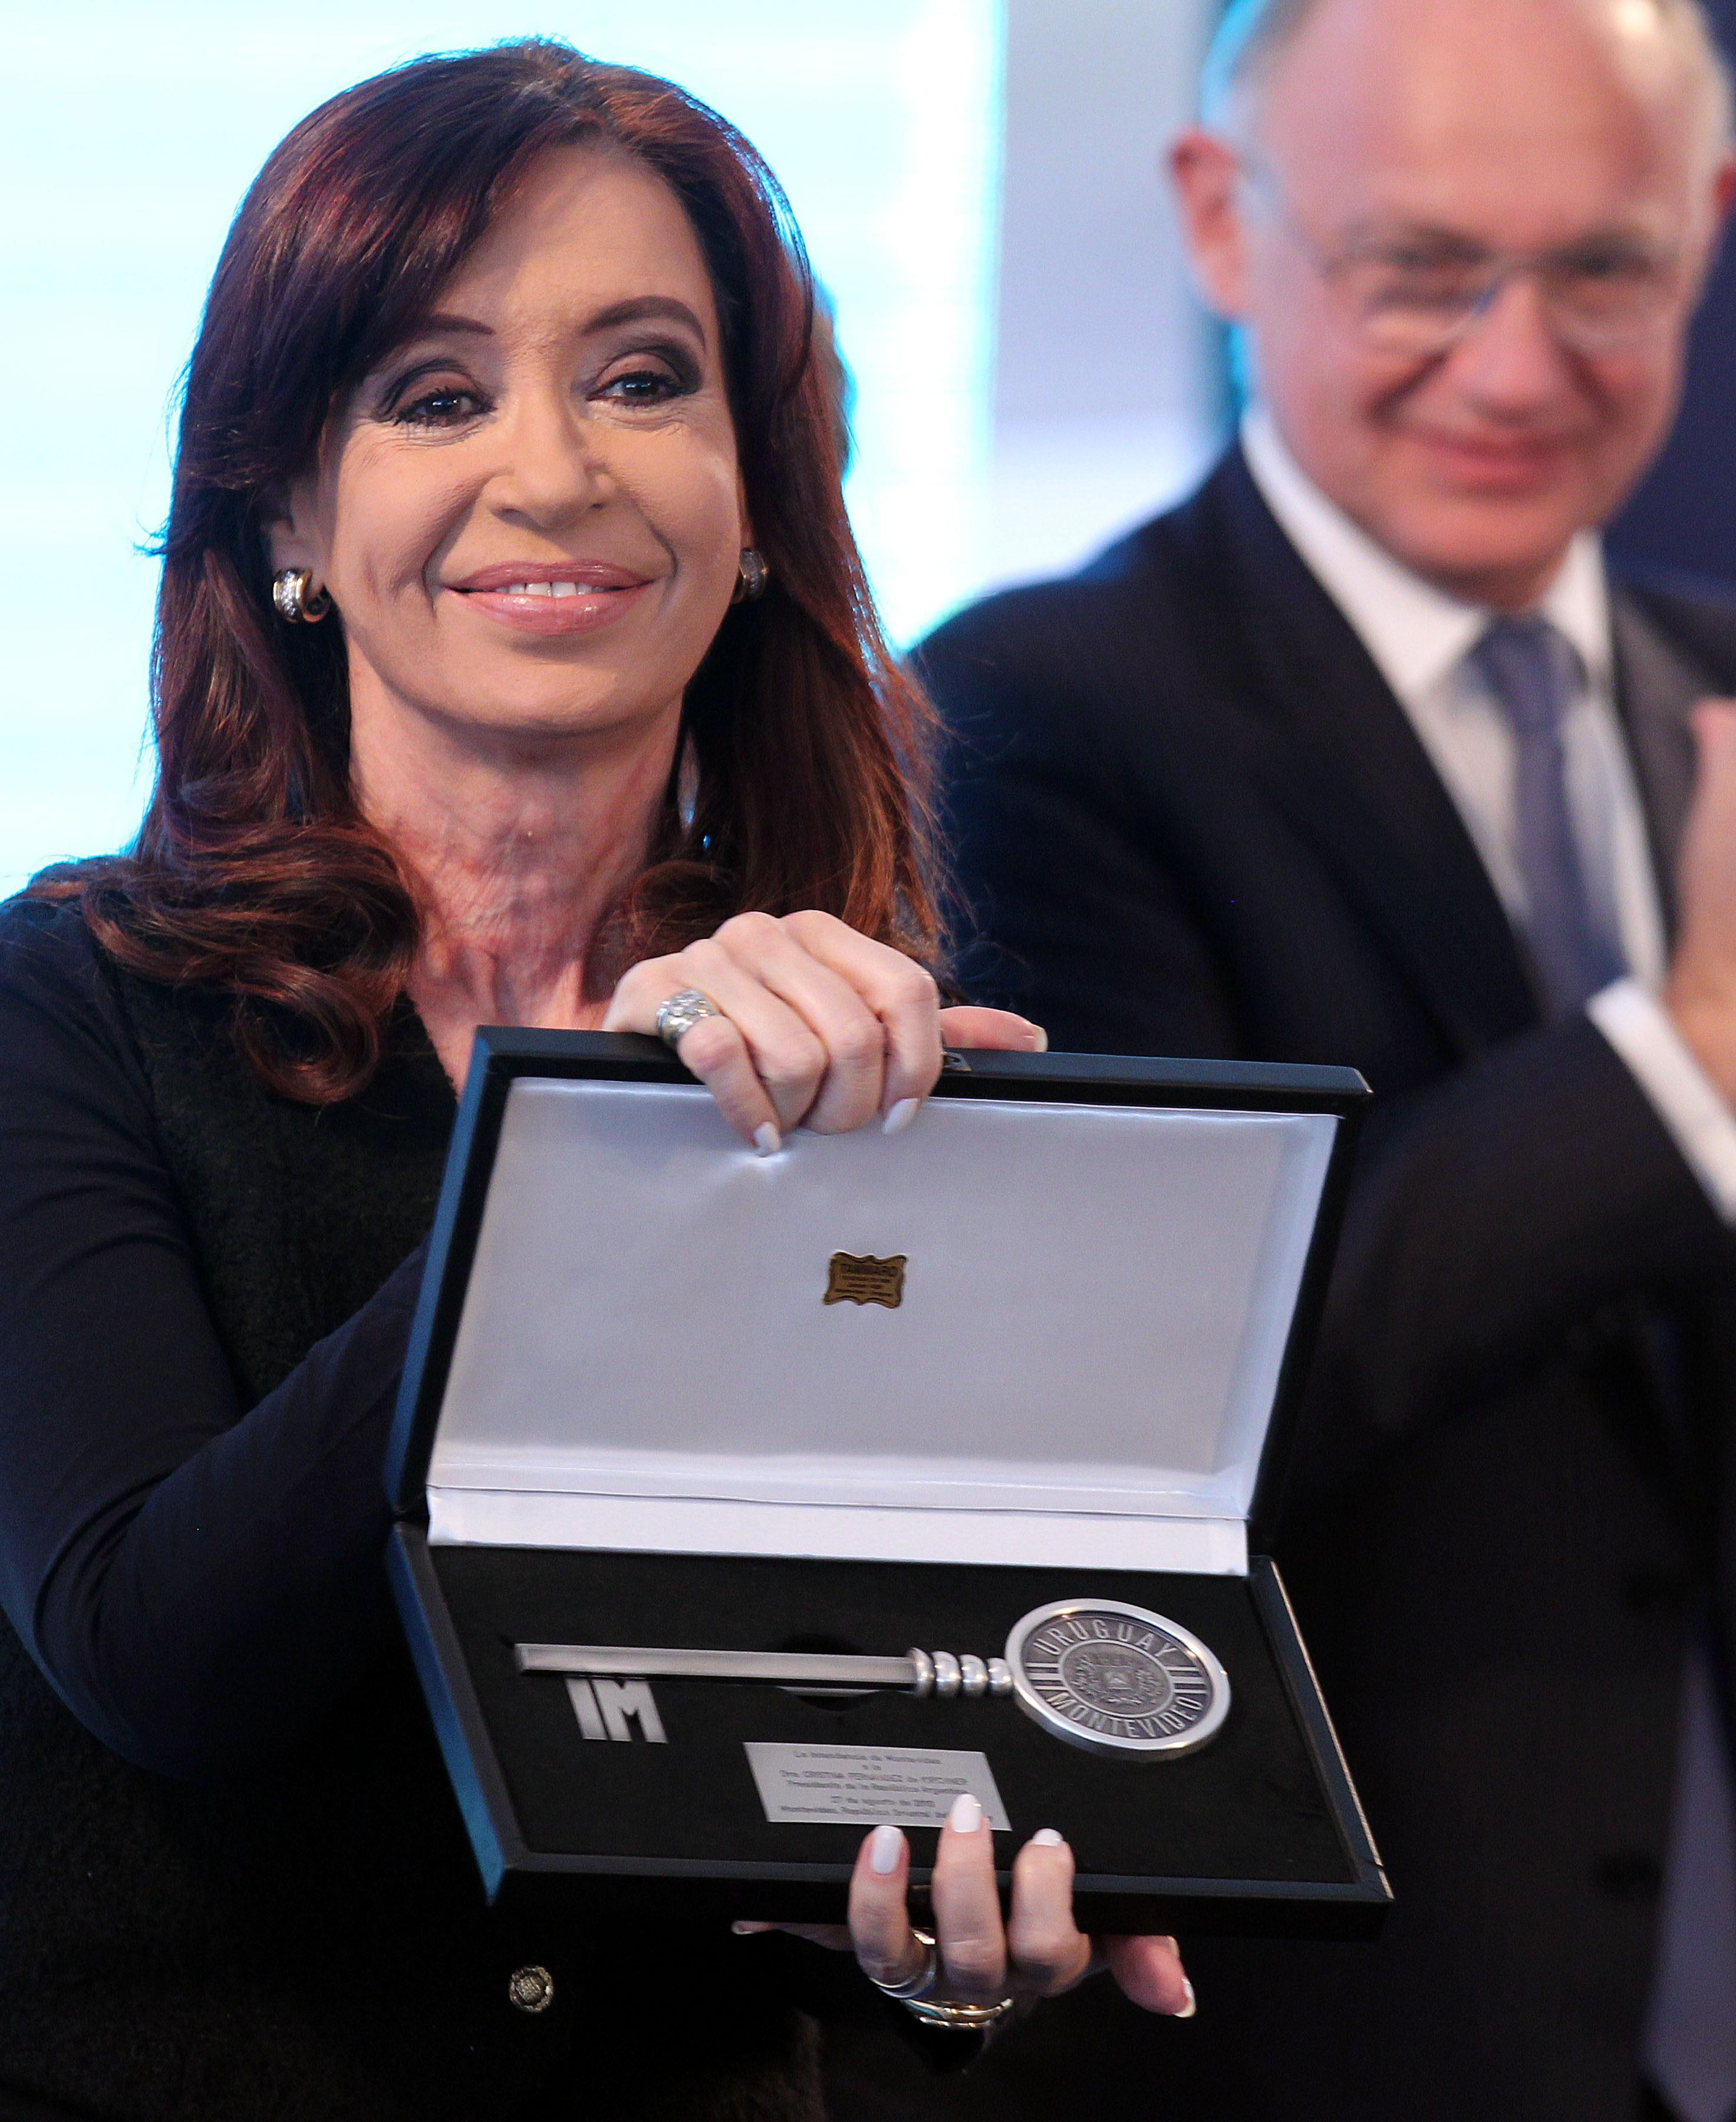 La presidenta argentina Cristina Fernández recibe el alta hospitalaria